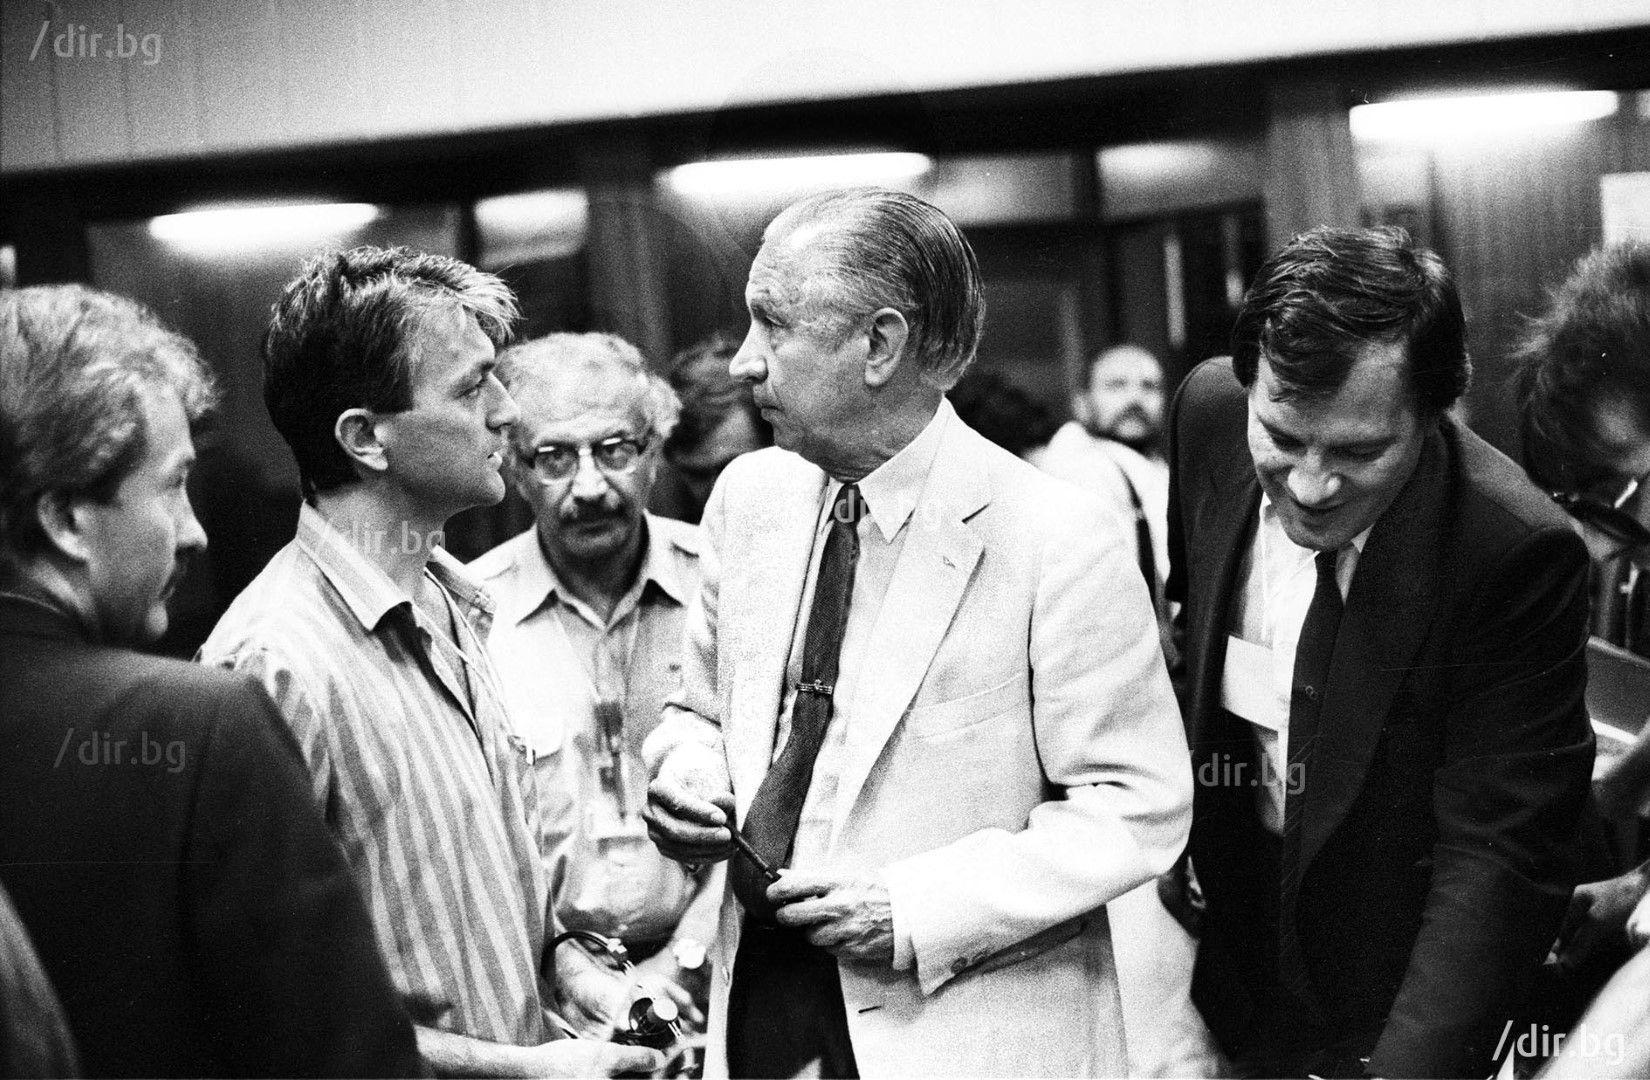 С Хуан Антонио Самаранч пред родни журналисти. Снимка: ИВАН ГРИГОРОВ